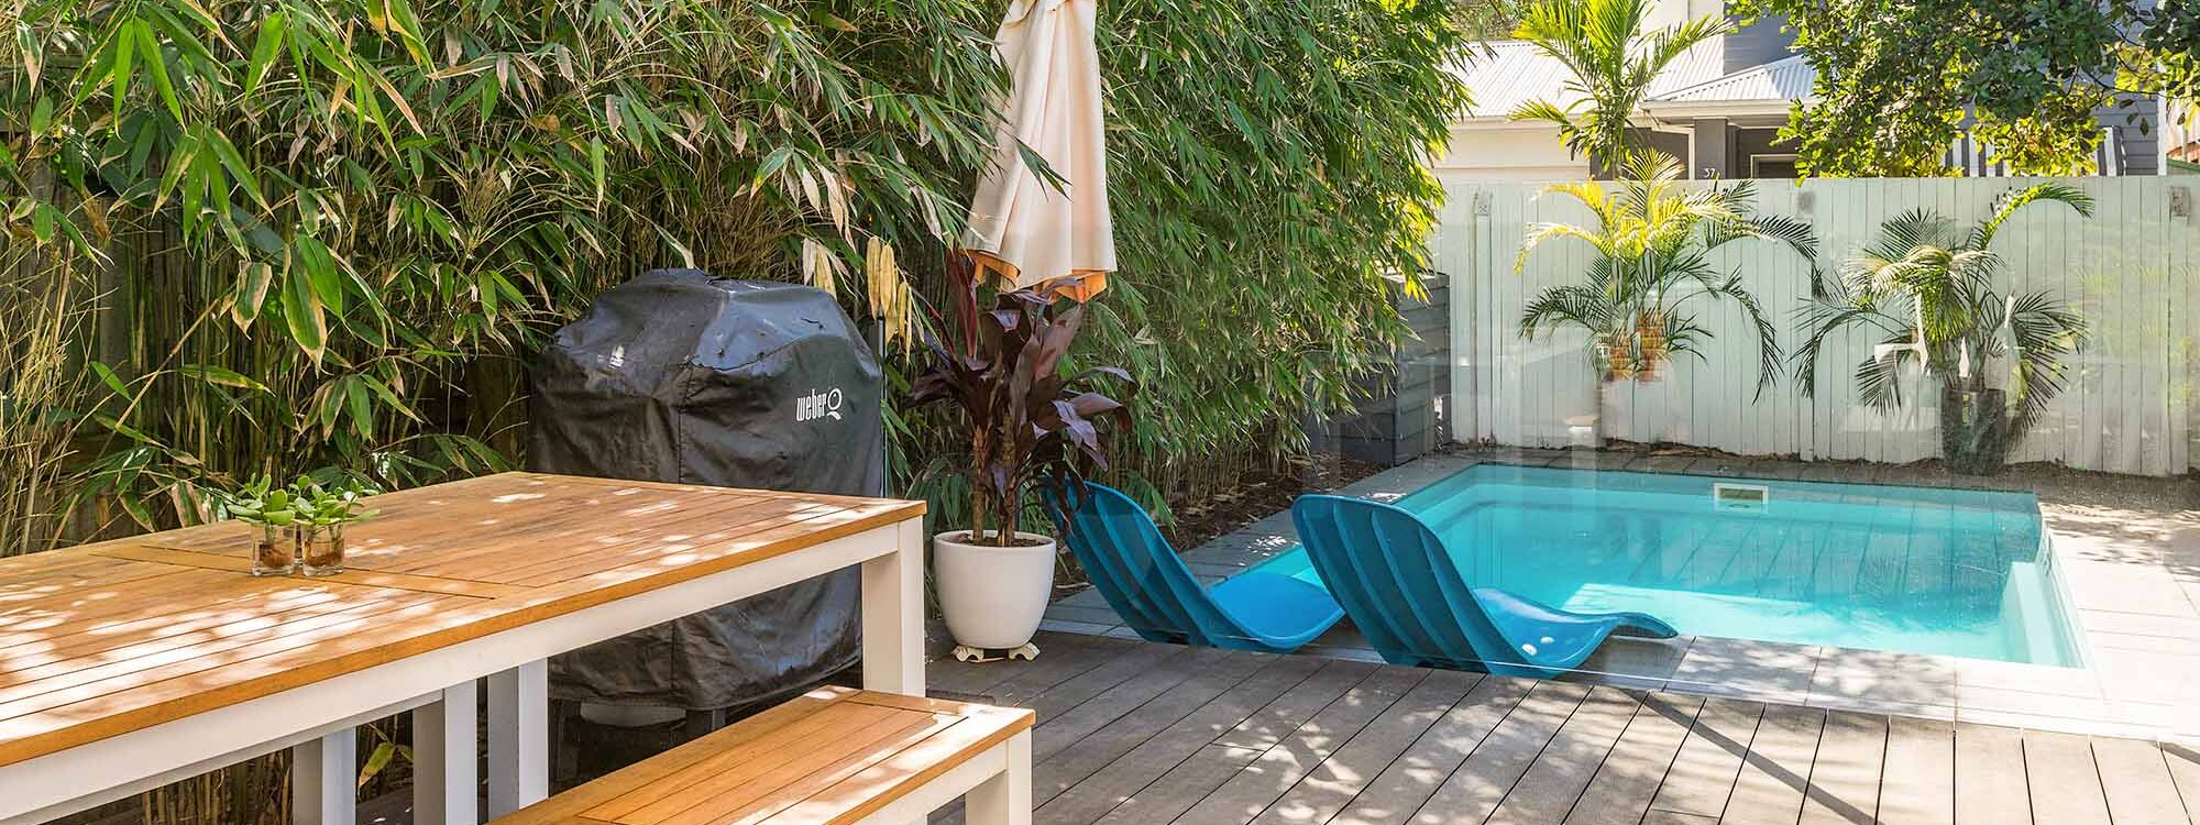 Aaloka Bay - Byron Bay - Pool and outdoor dining